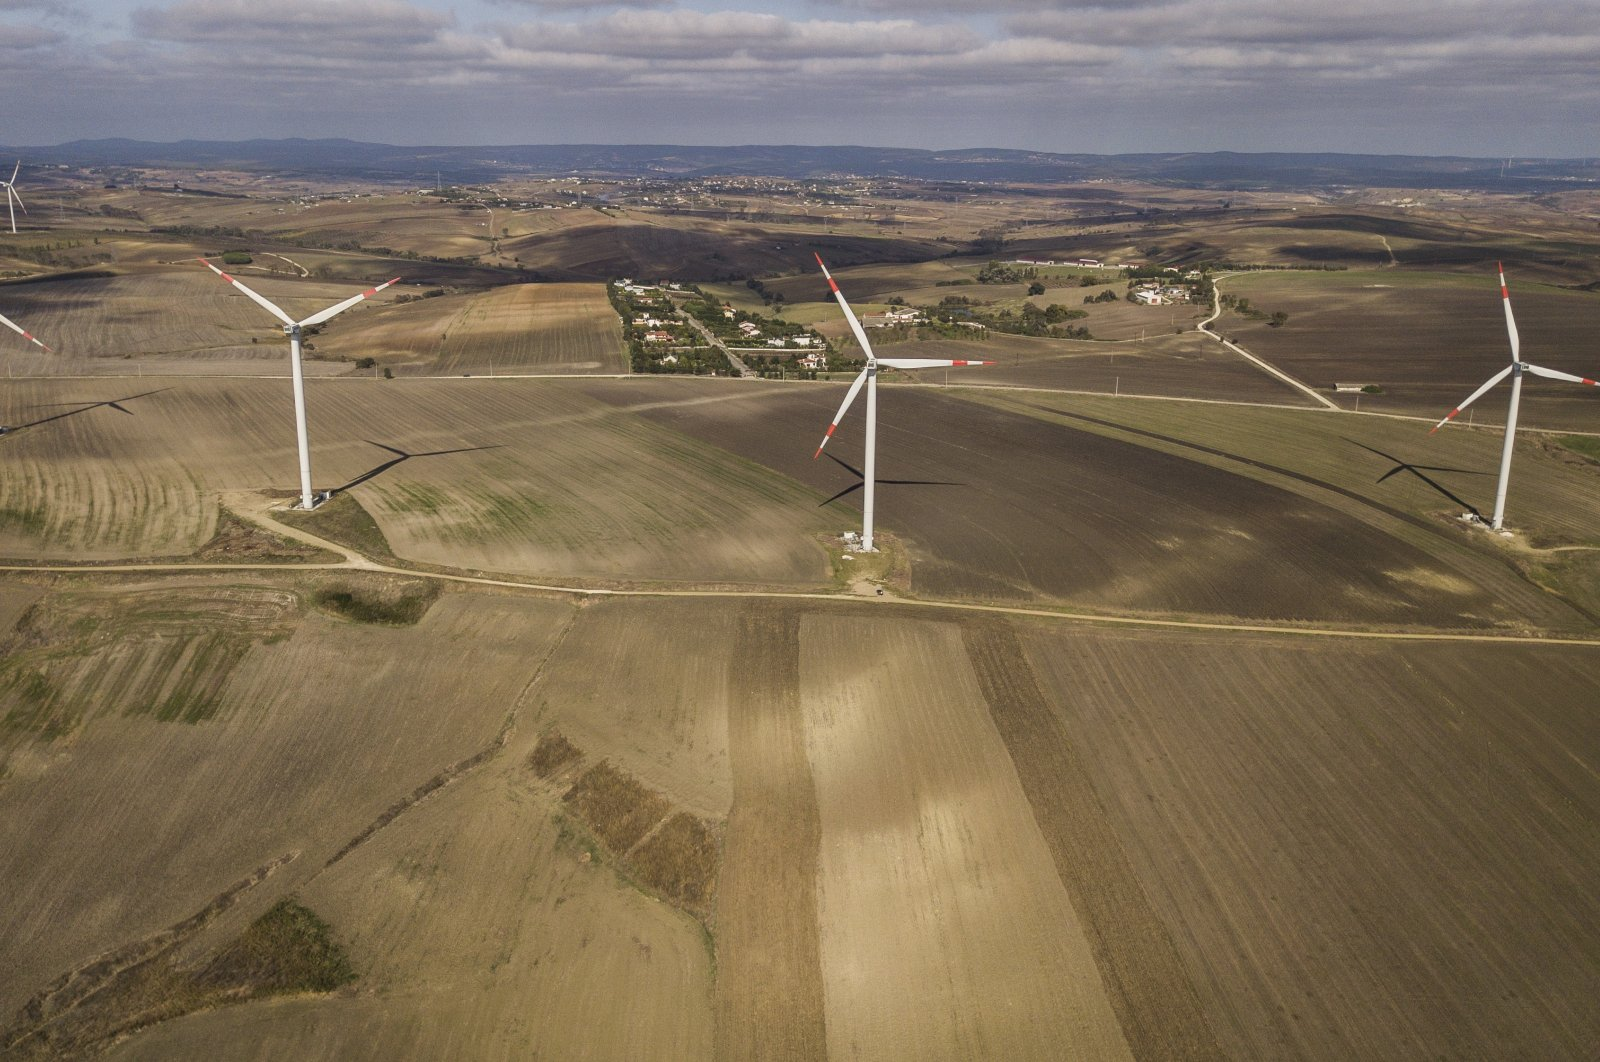 Wind turbines dot the countryside of Istanbul, Turkey, Oct. 22, 2020. (EPA Photo)